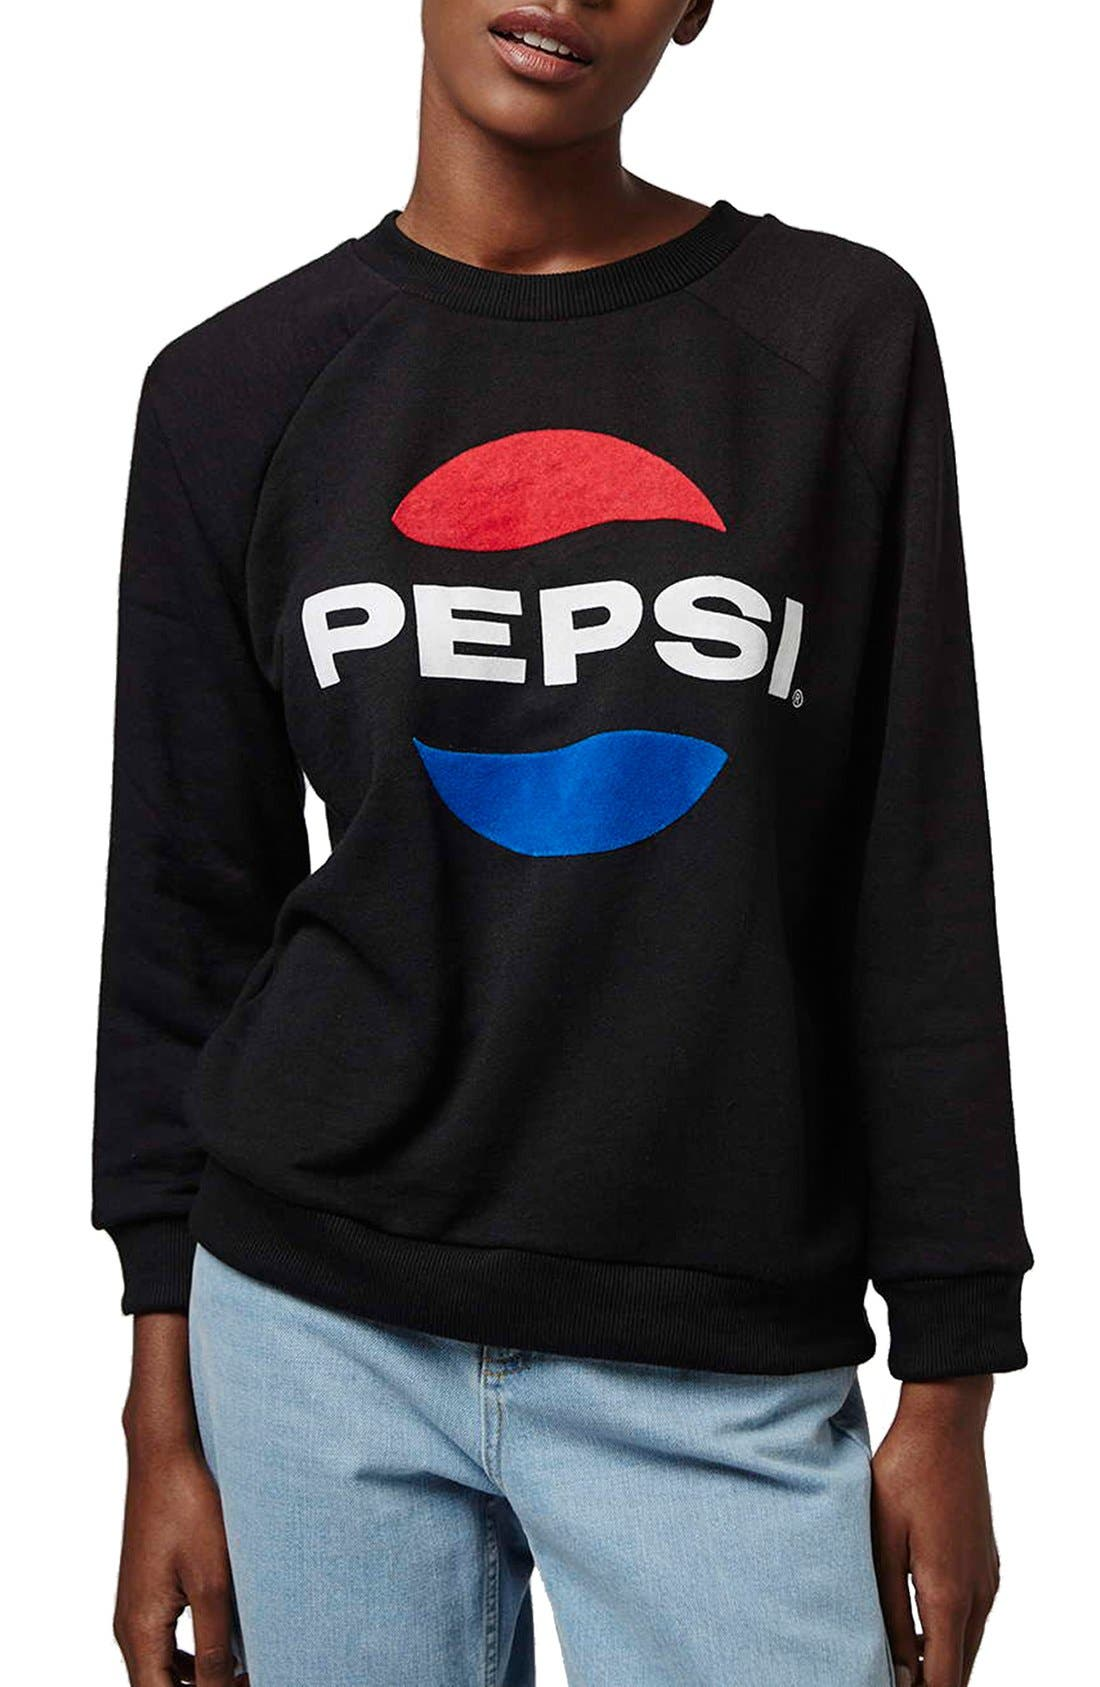 Alternate Image 1 Selected - Topshop Tee and Cake 'Pepsi' Sweatshirt (Petite)